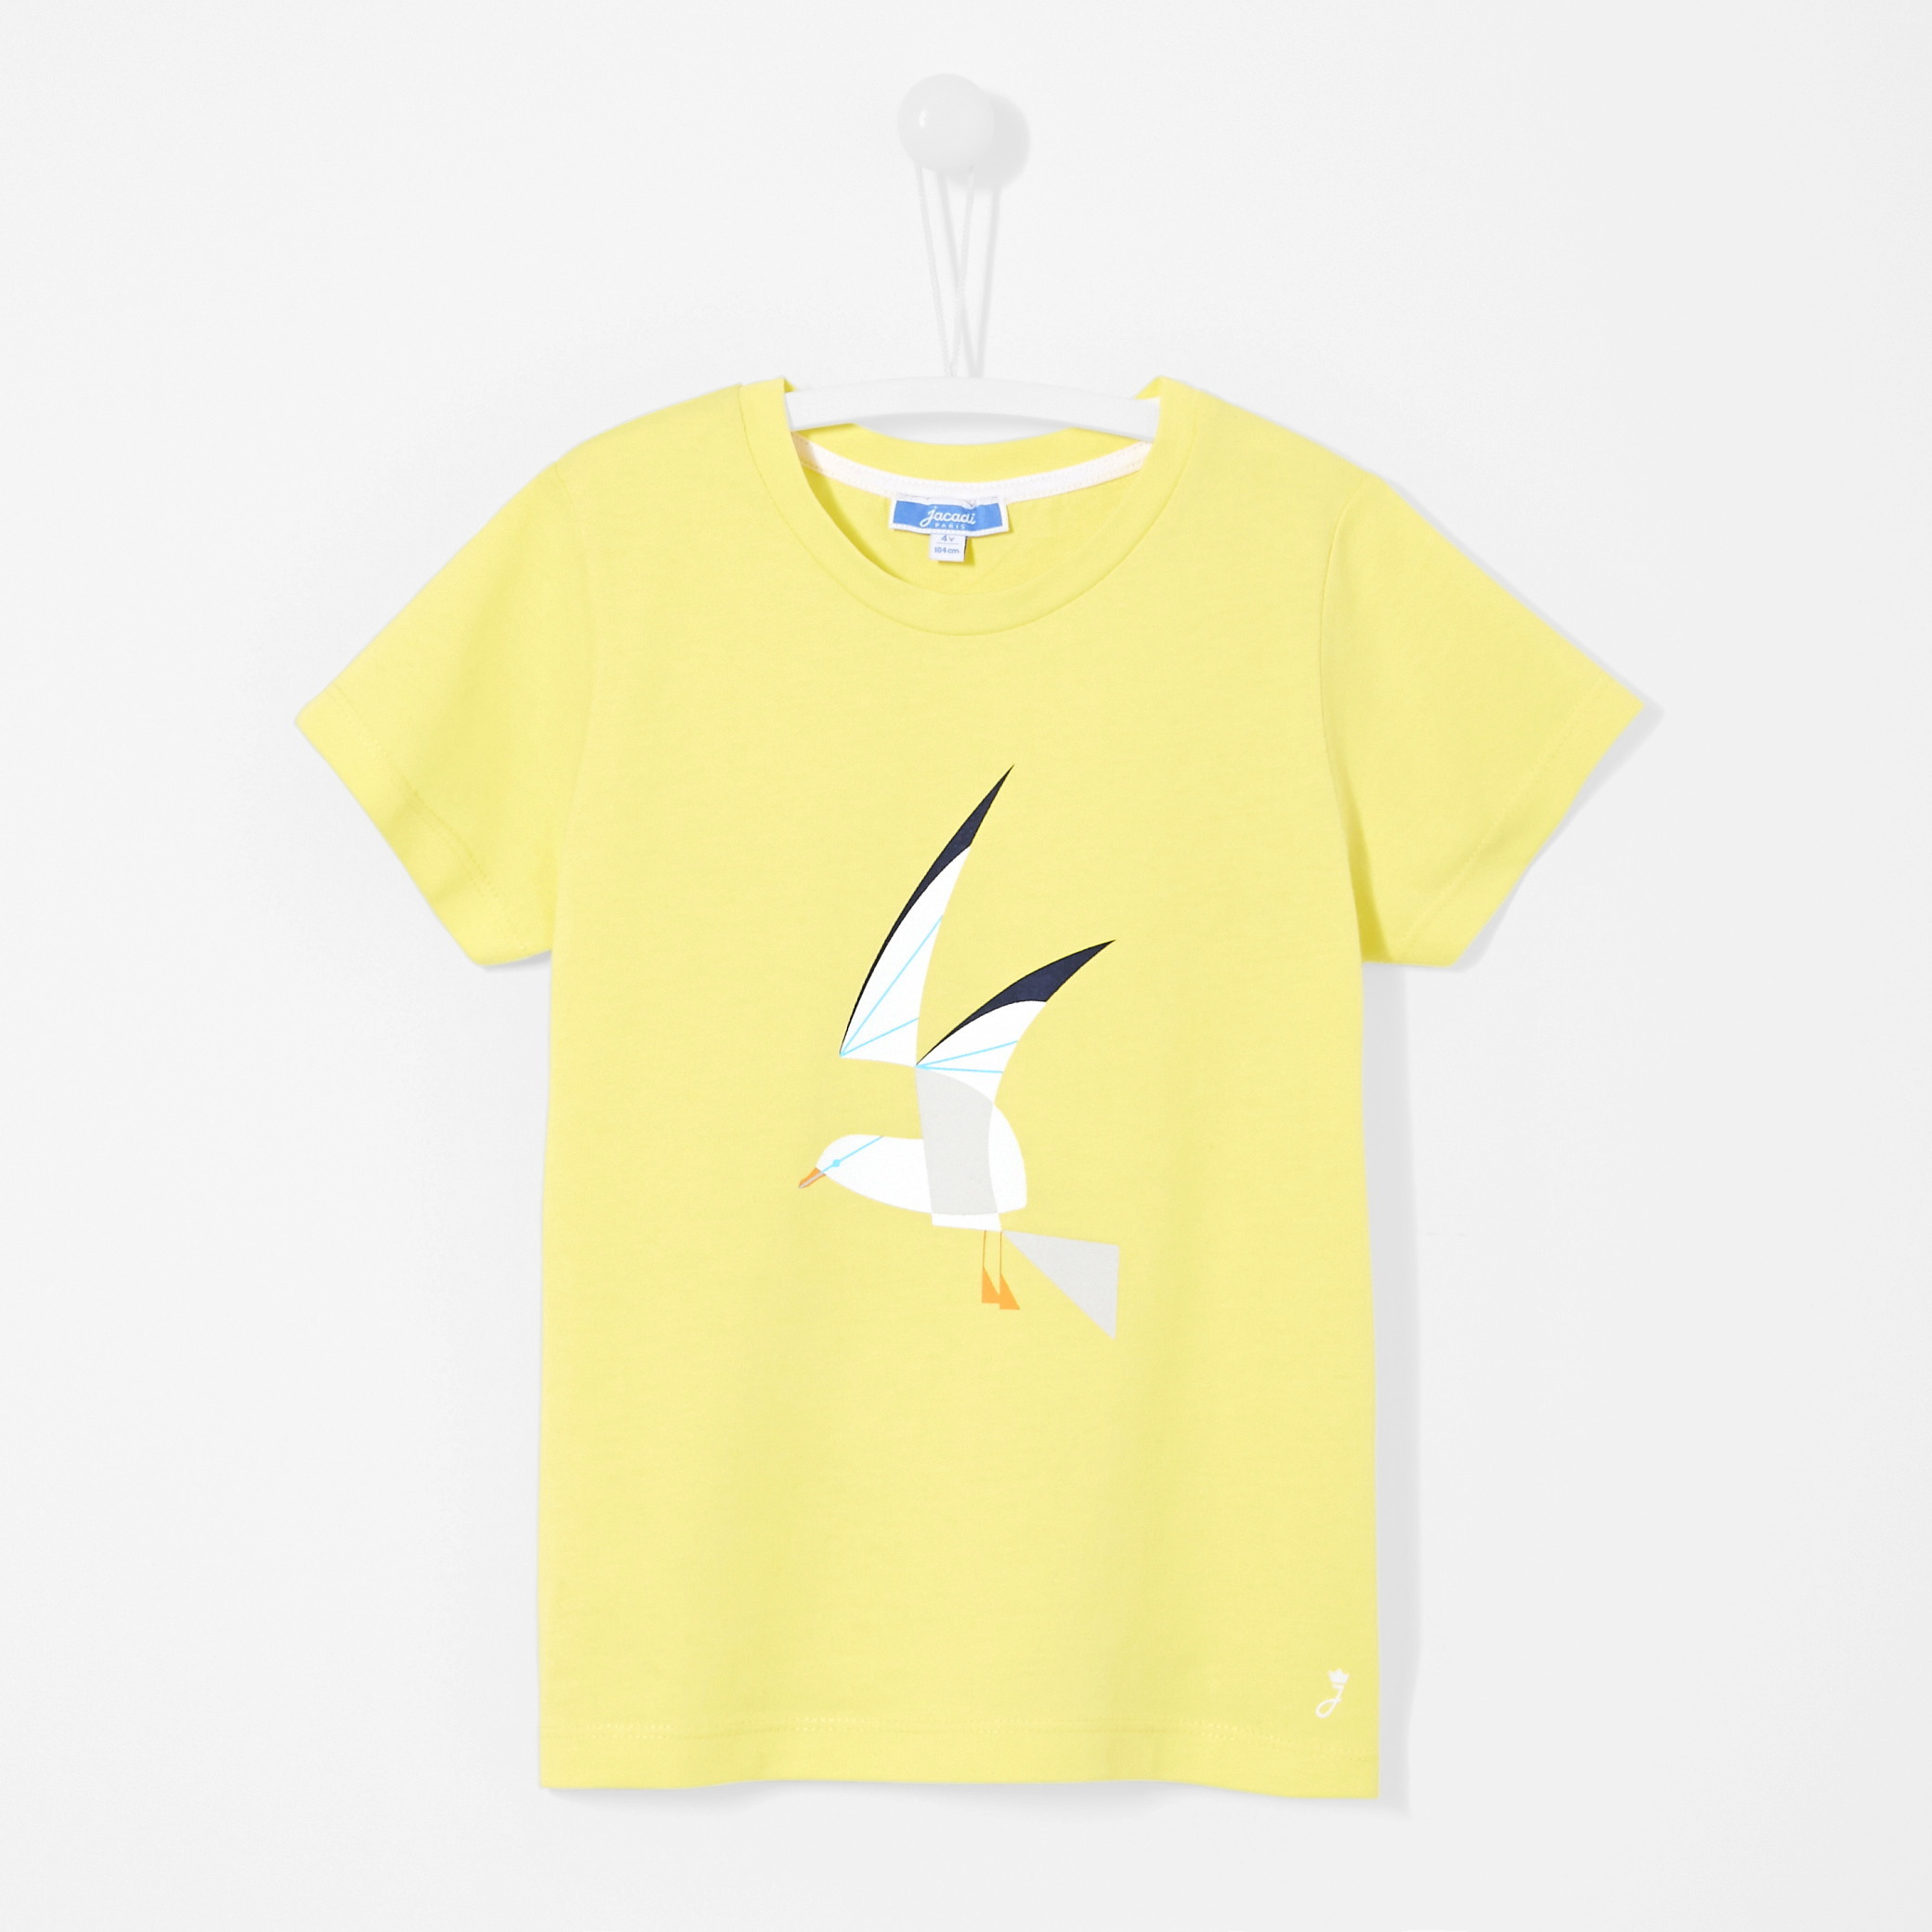 seagull-shirt.jpg